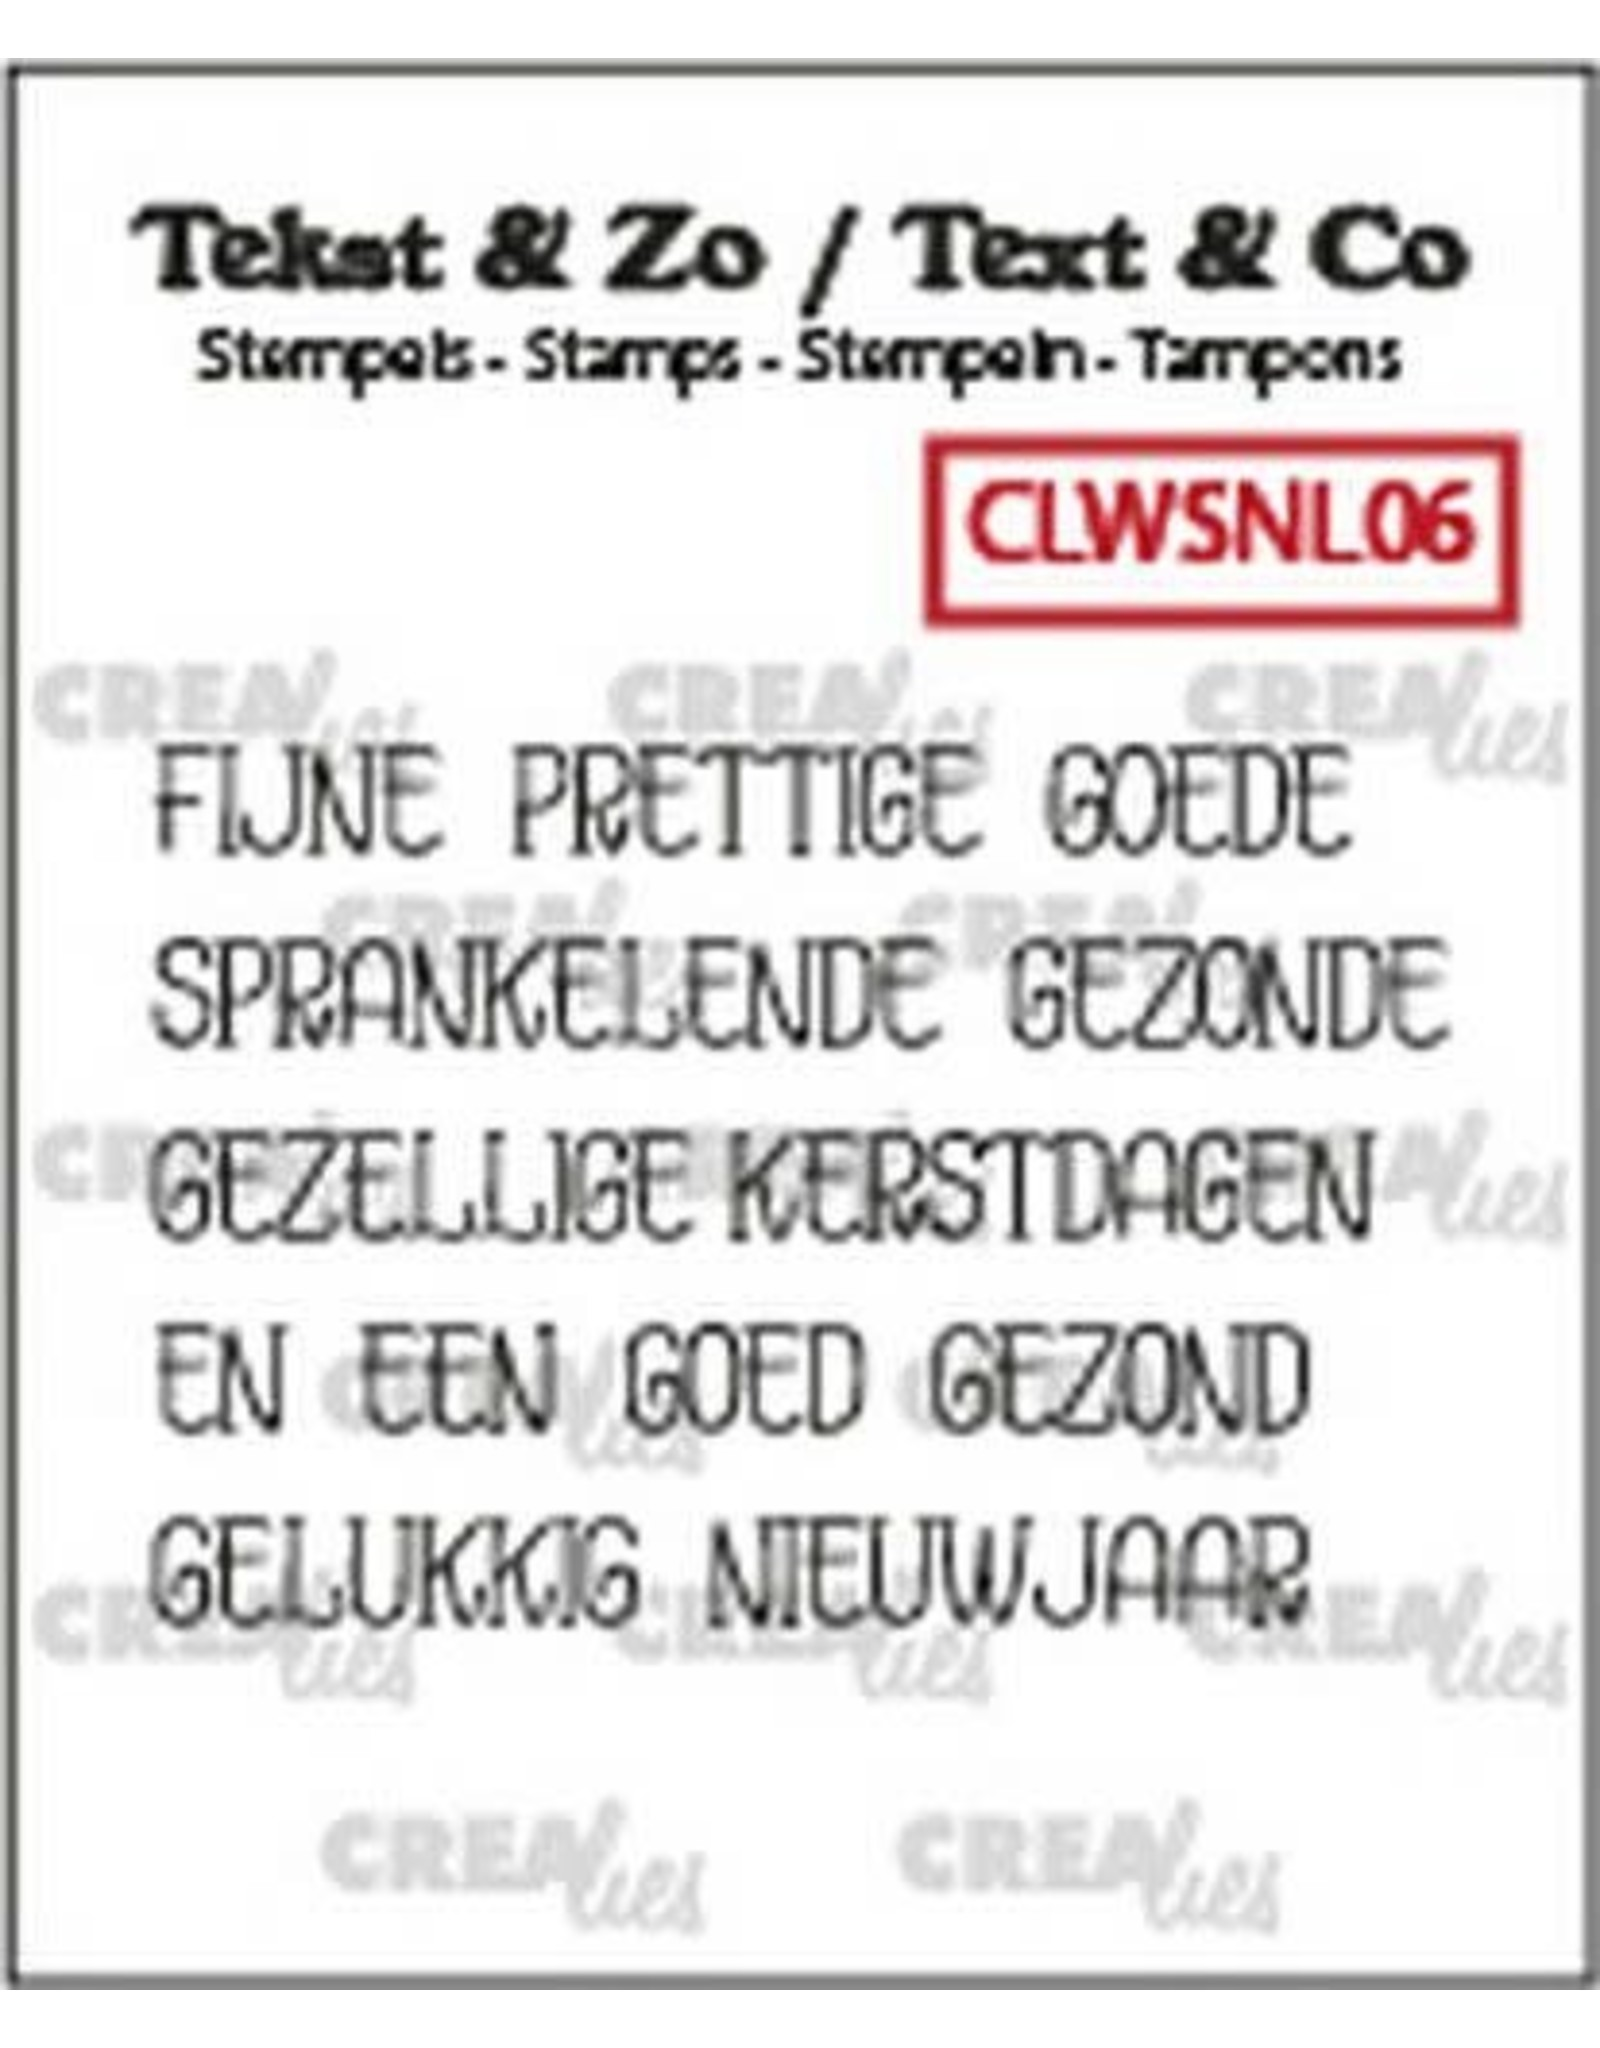 Crealies Crealies Clearstamp Tekst & Zo woordstrips KERST (NL) CLWSNL06 5x 4x45mm